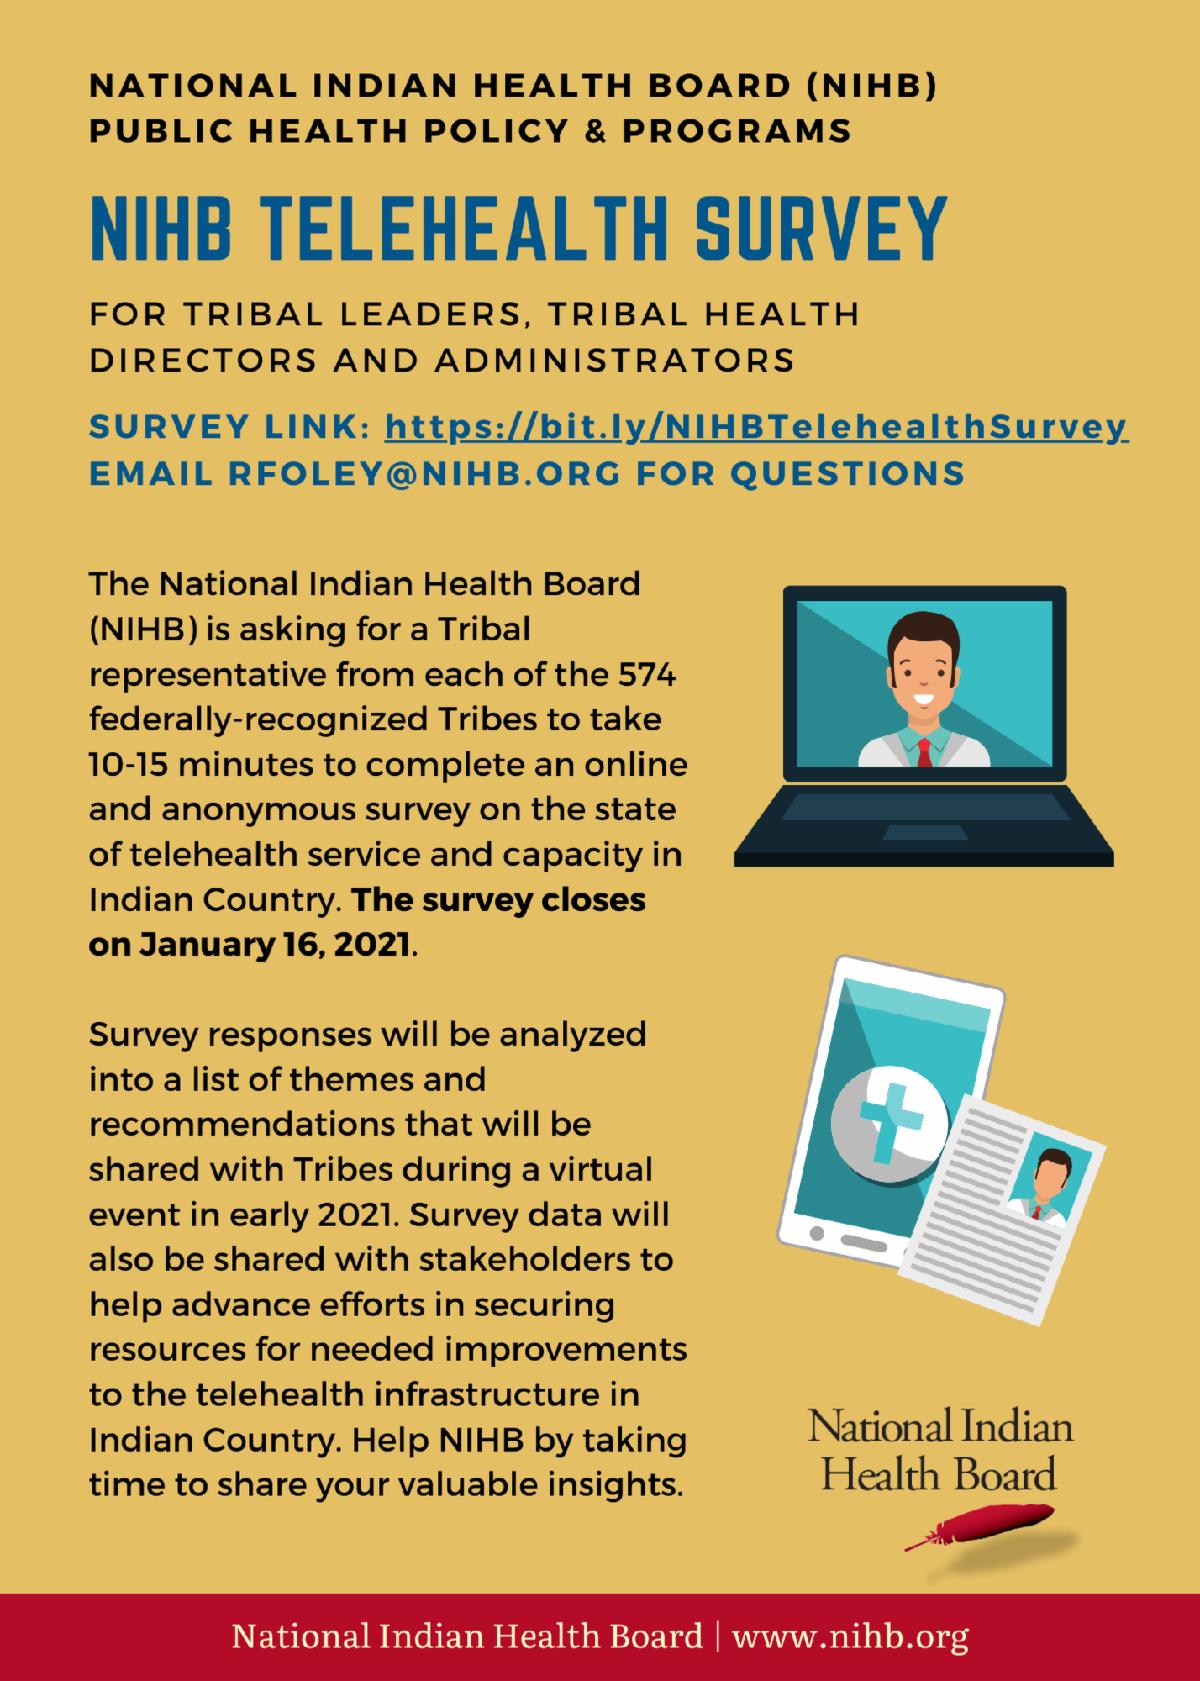 NIHB Telehealth Survey